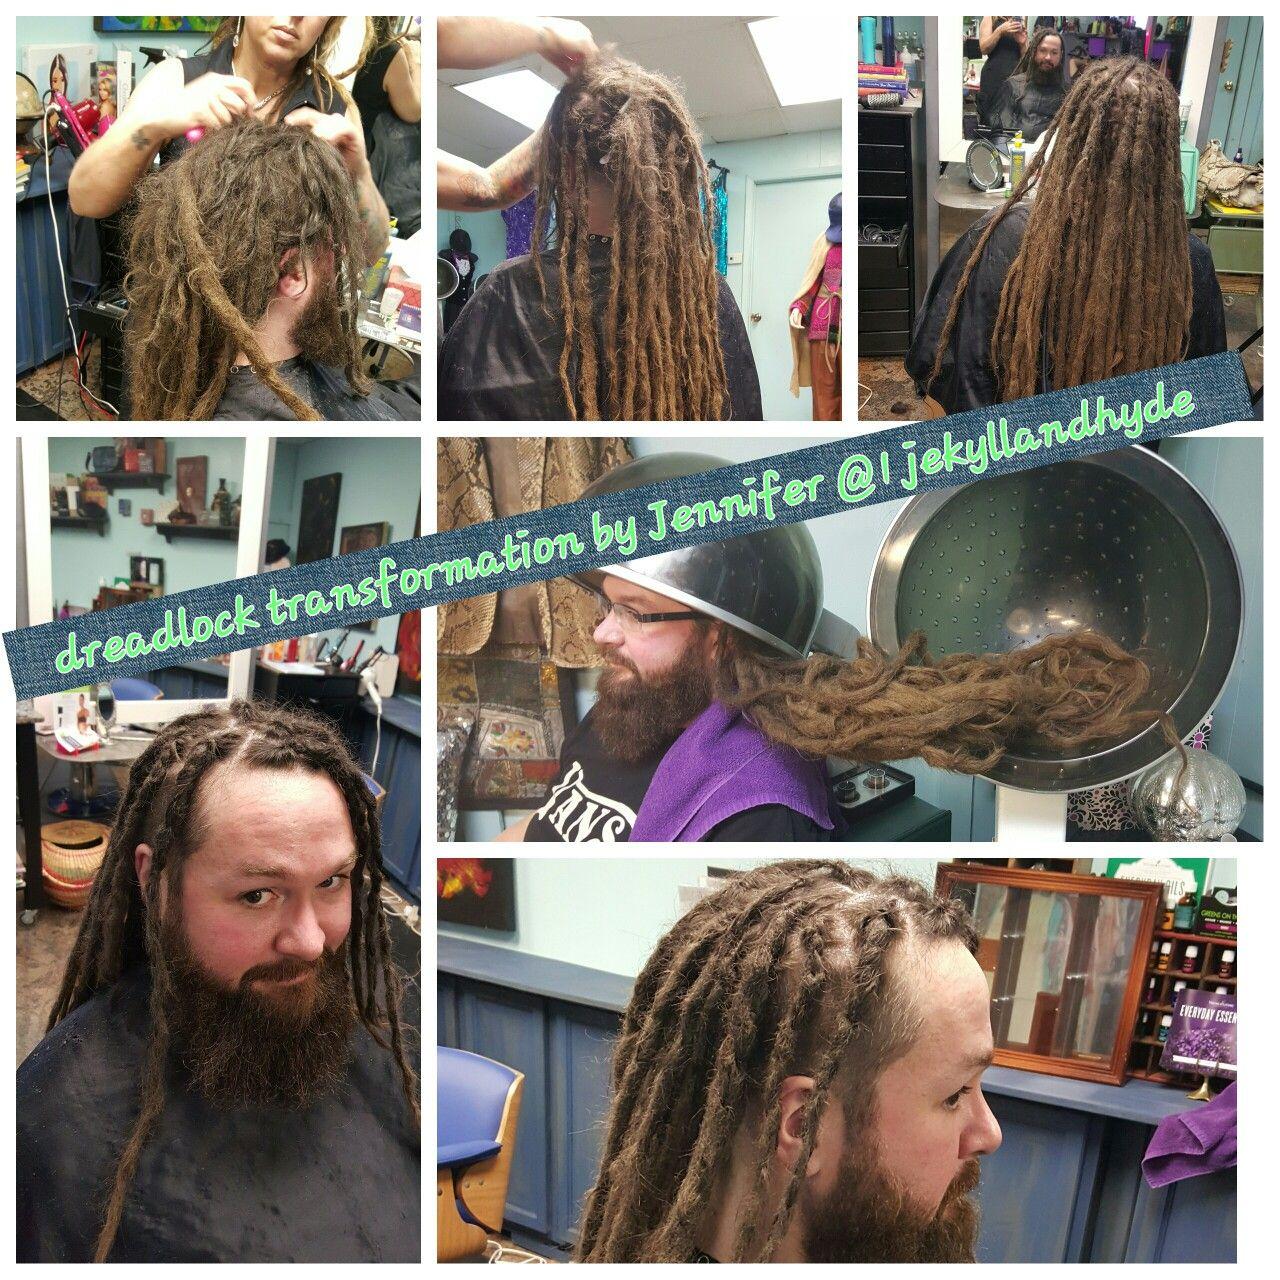 Transformation Dreadlocks Dreads Locs Itisallhis Hairstylist